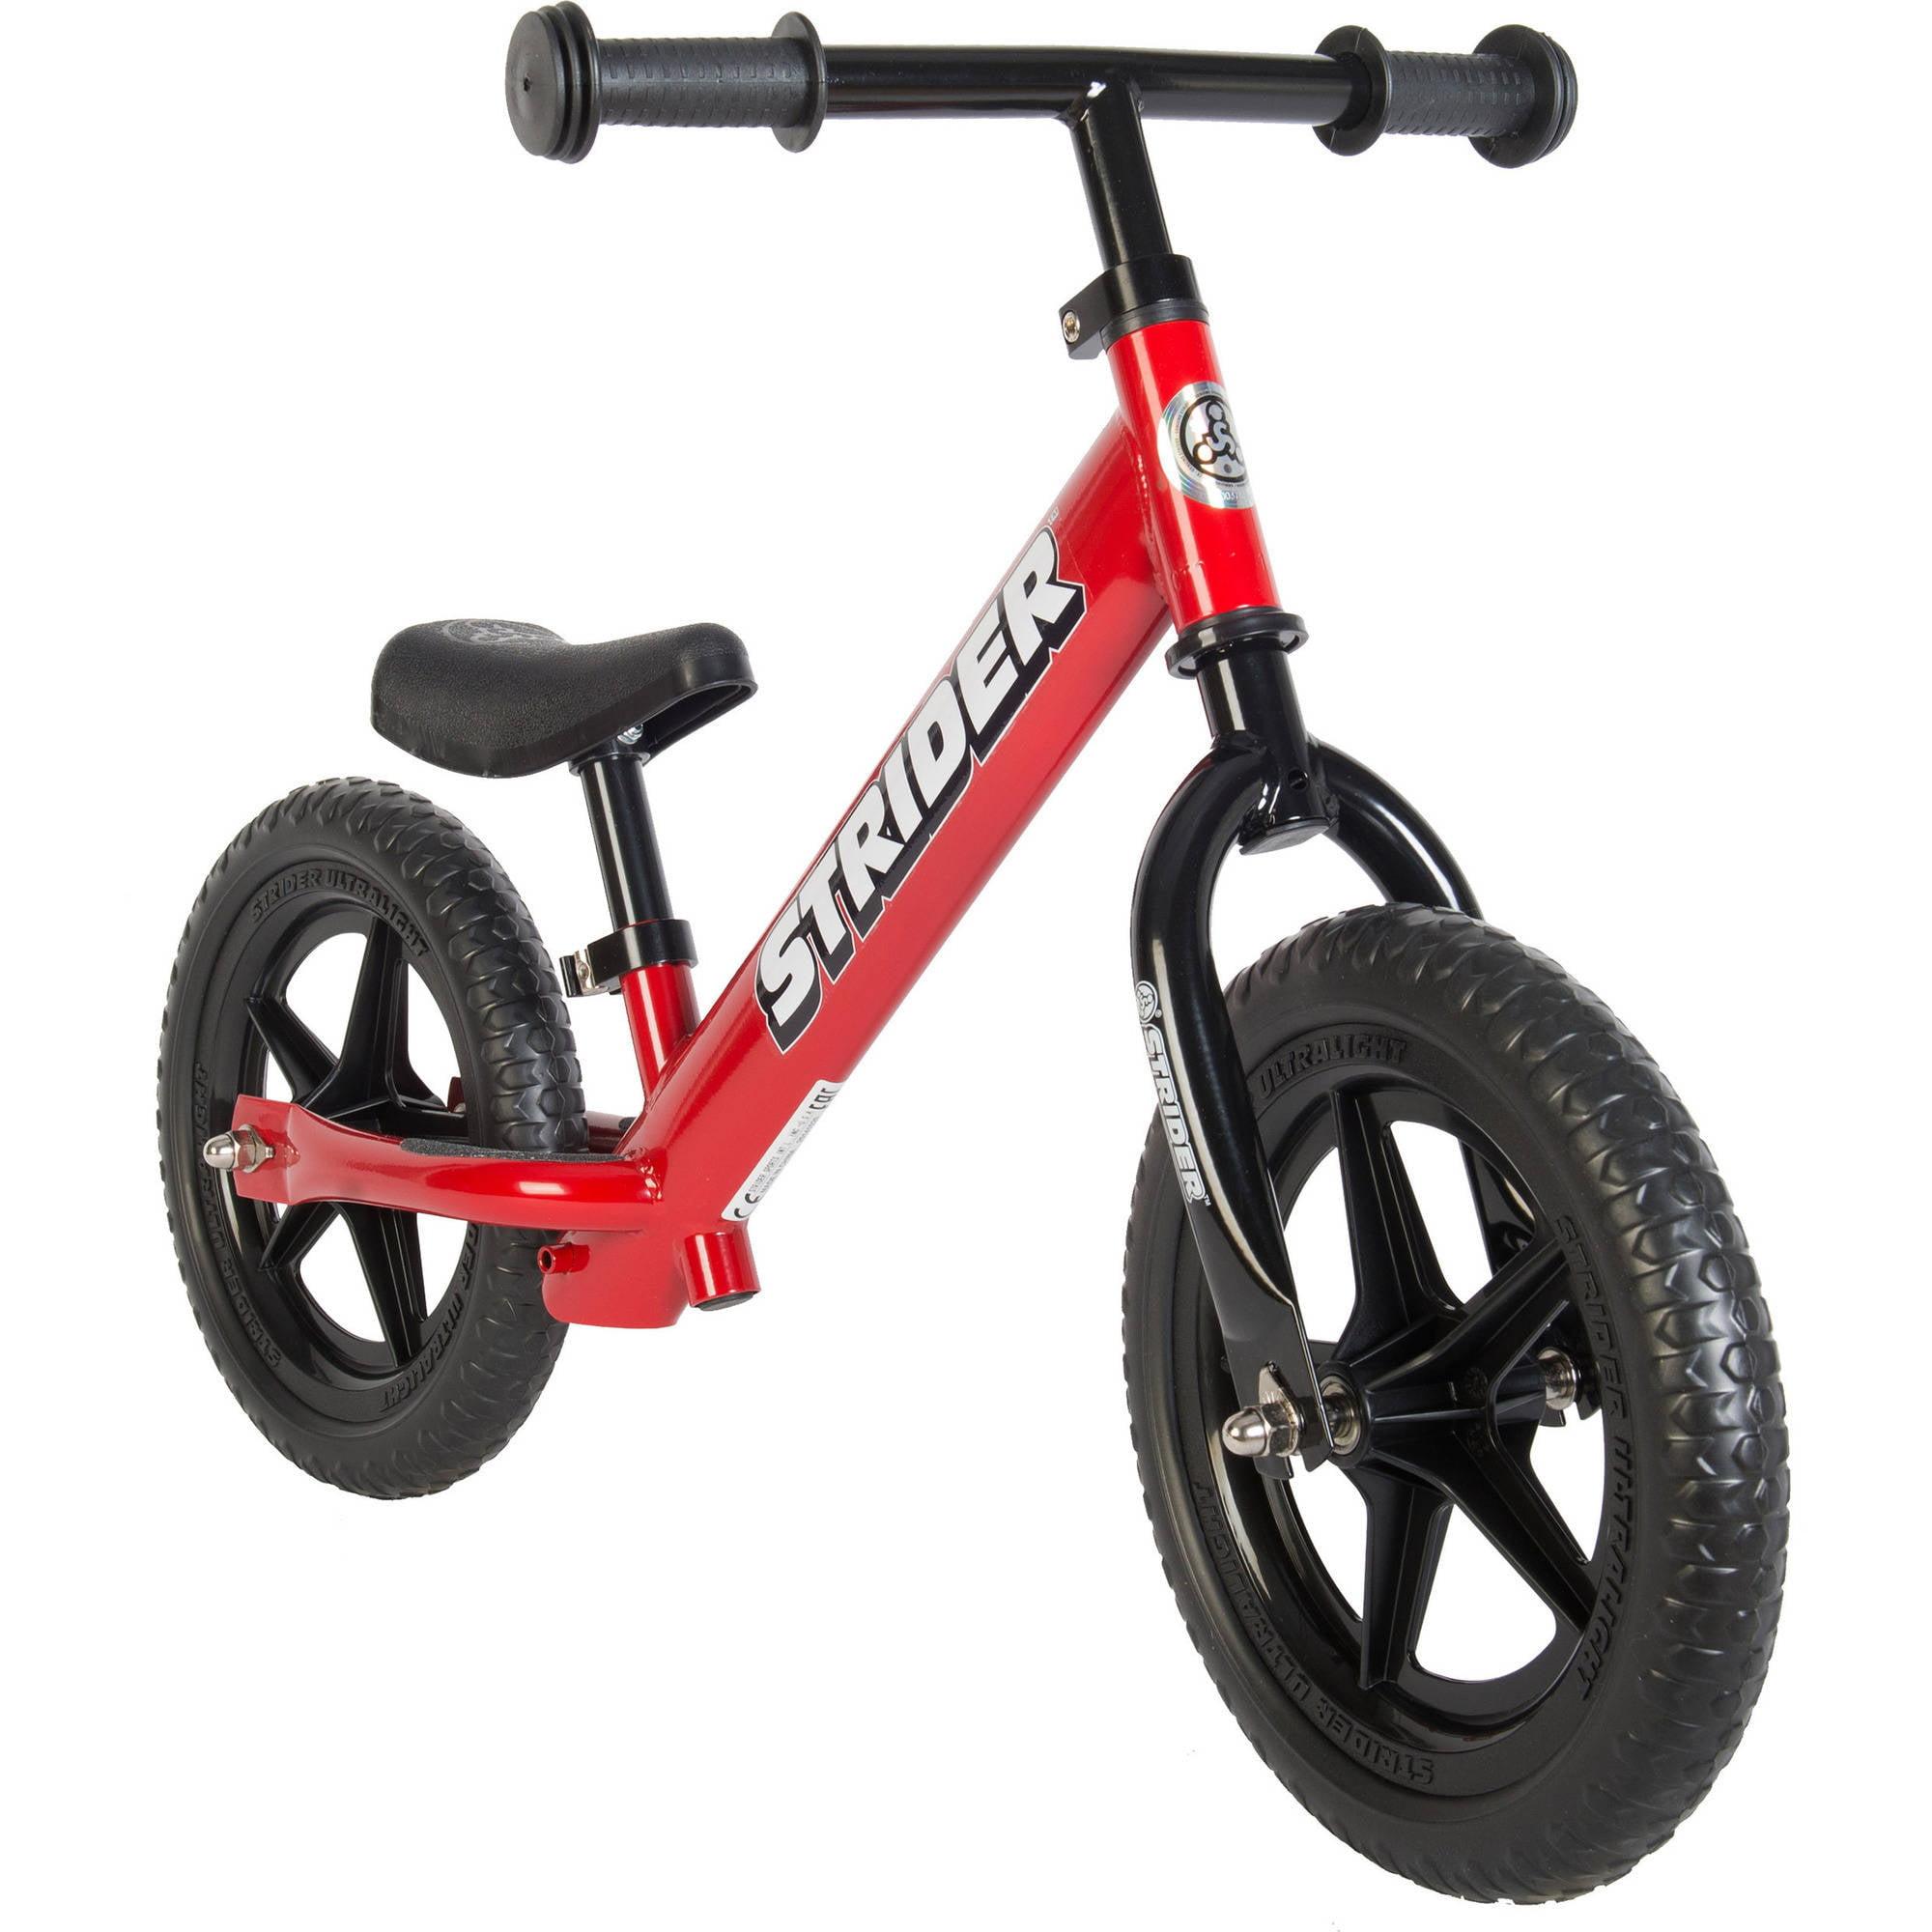 STRIDER 12 Classic Balance Bike, Red